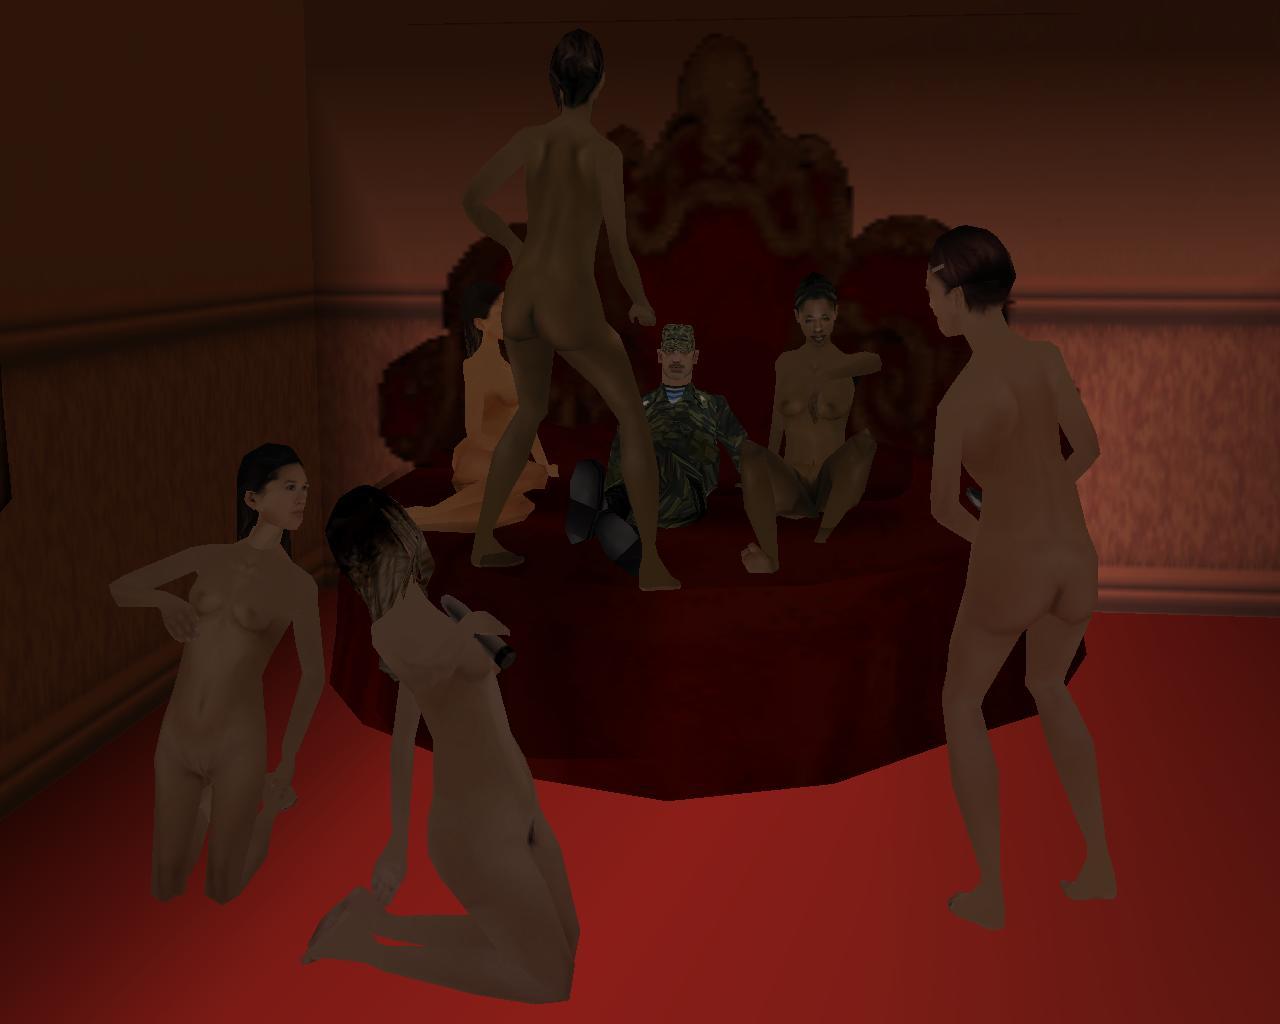 San andreas xxx erotic movies